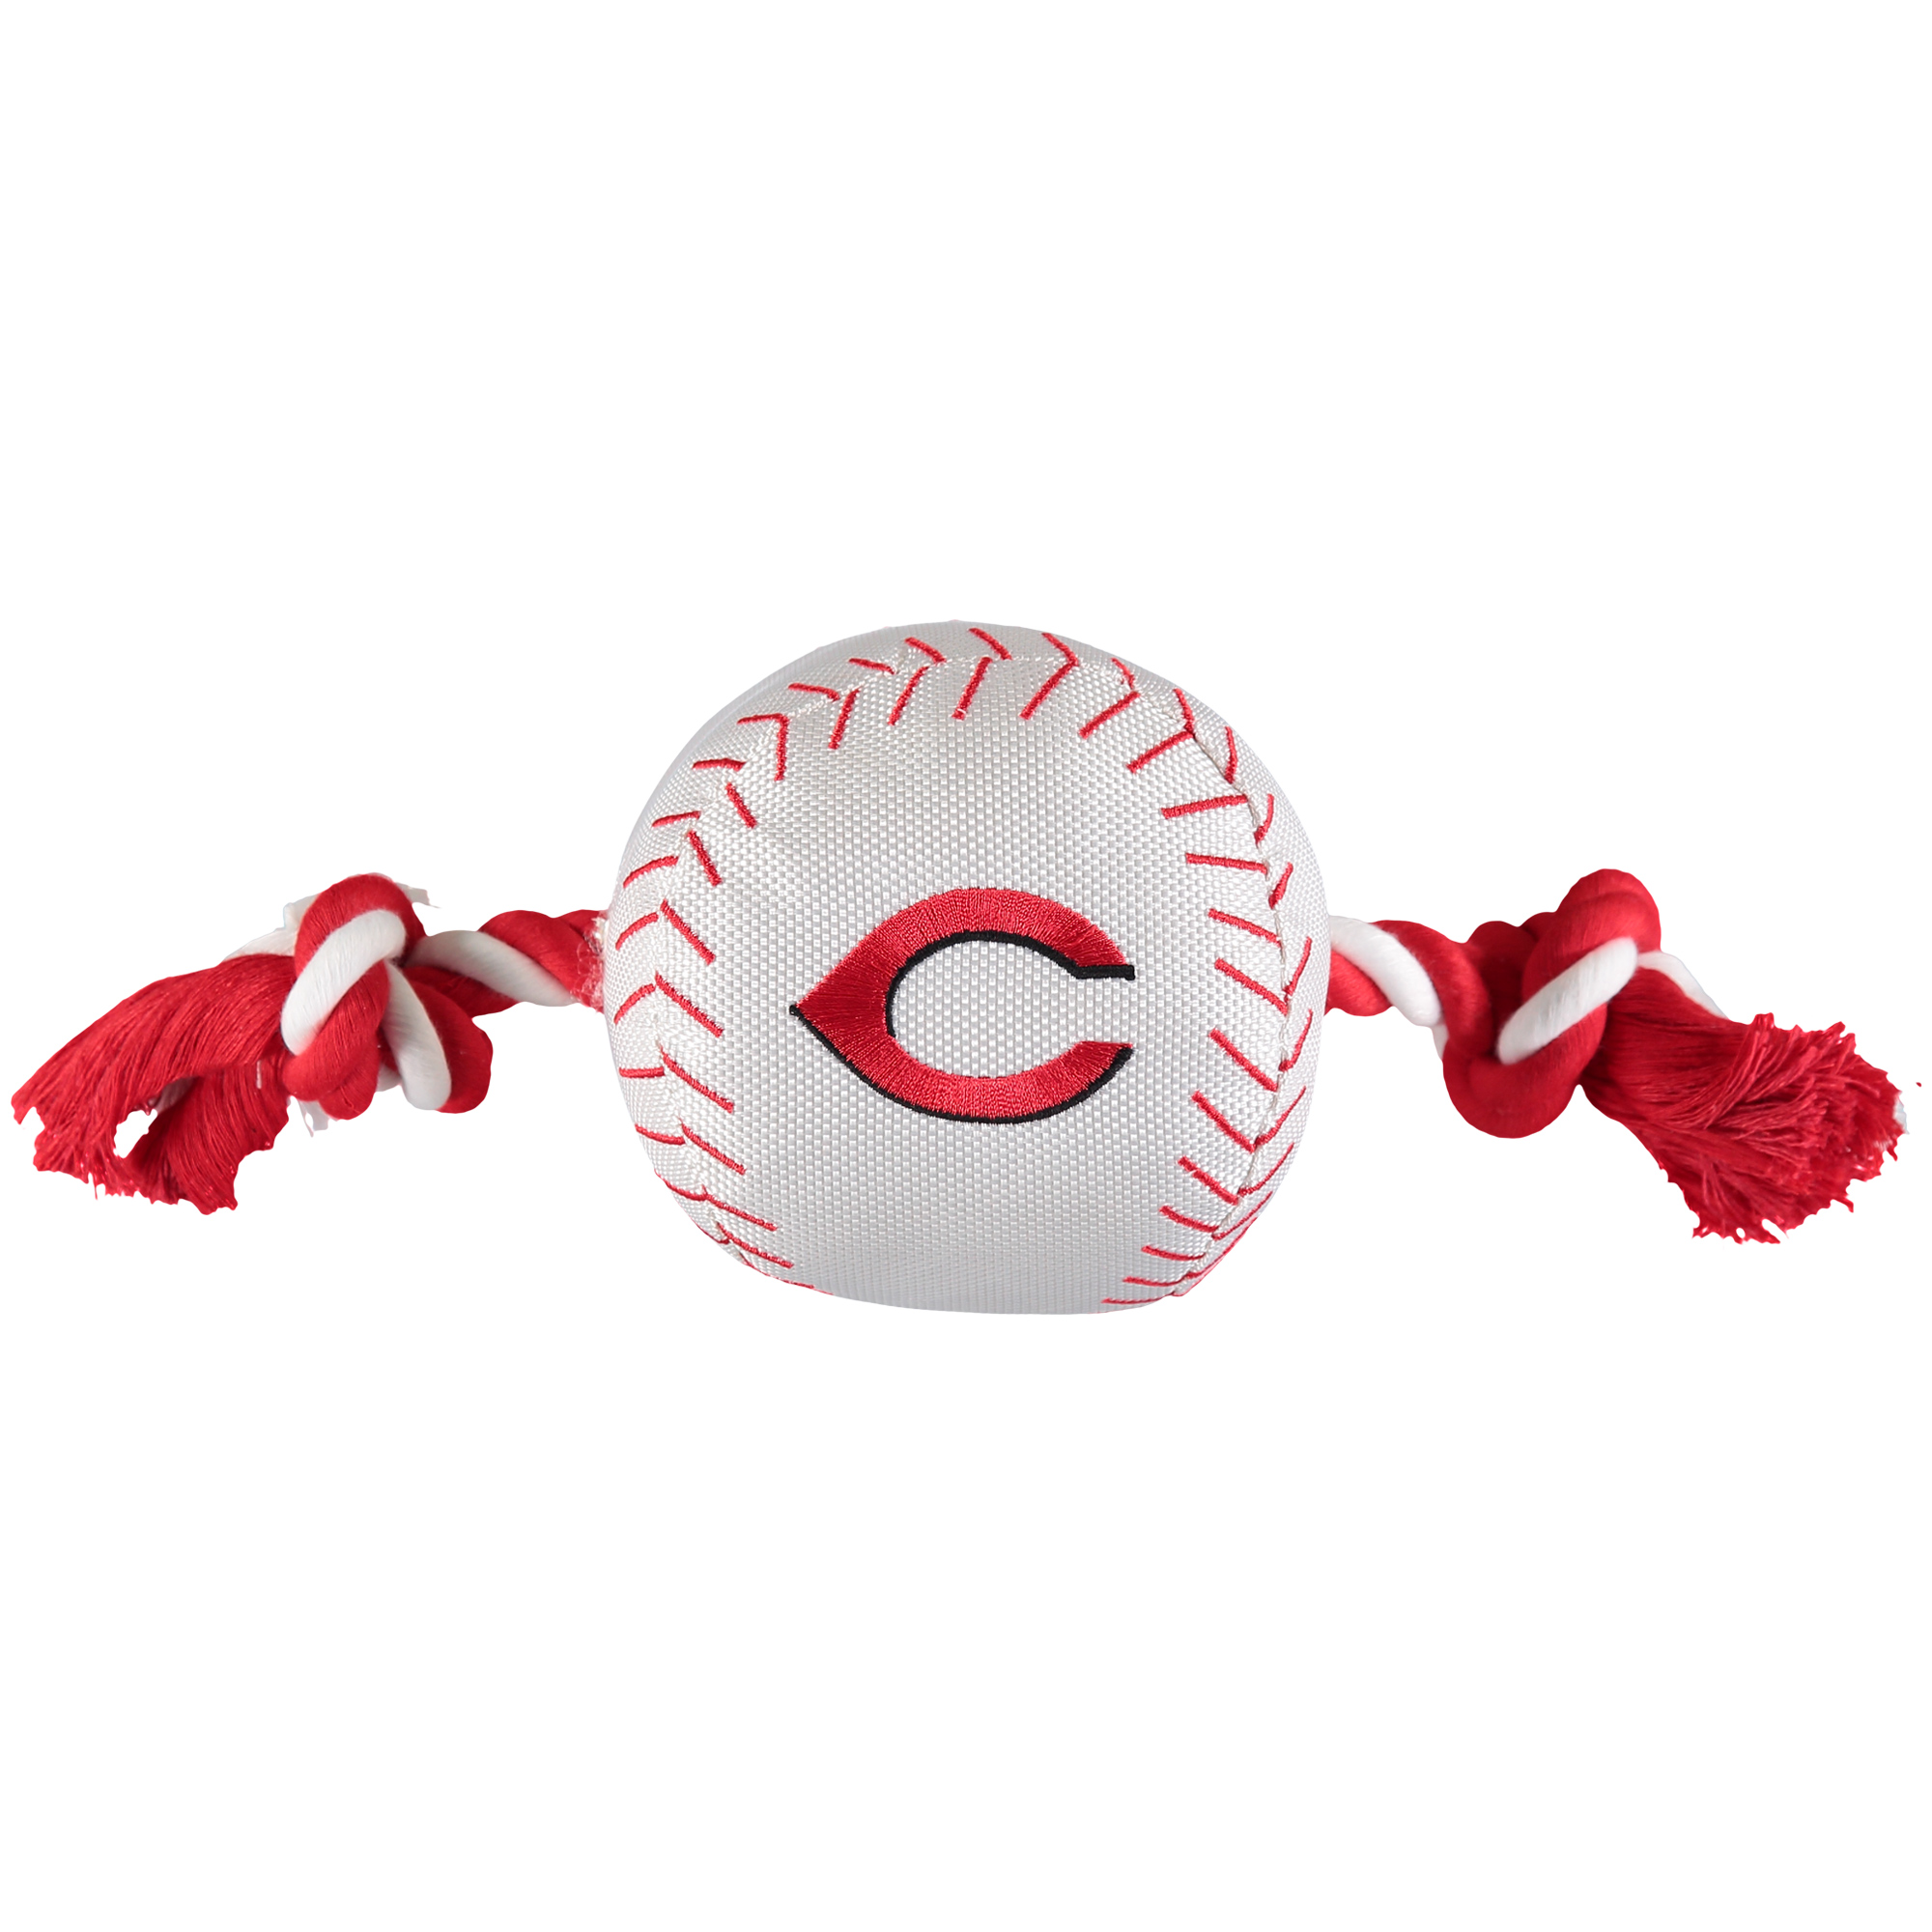 Cincinnati Reds Dog Baseball Rope Toy - No Size